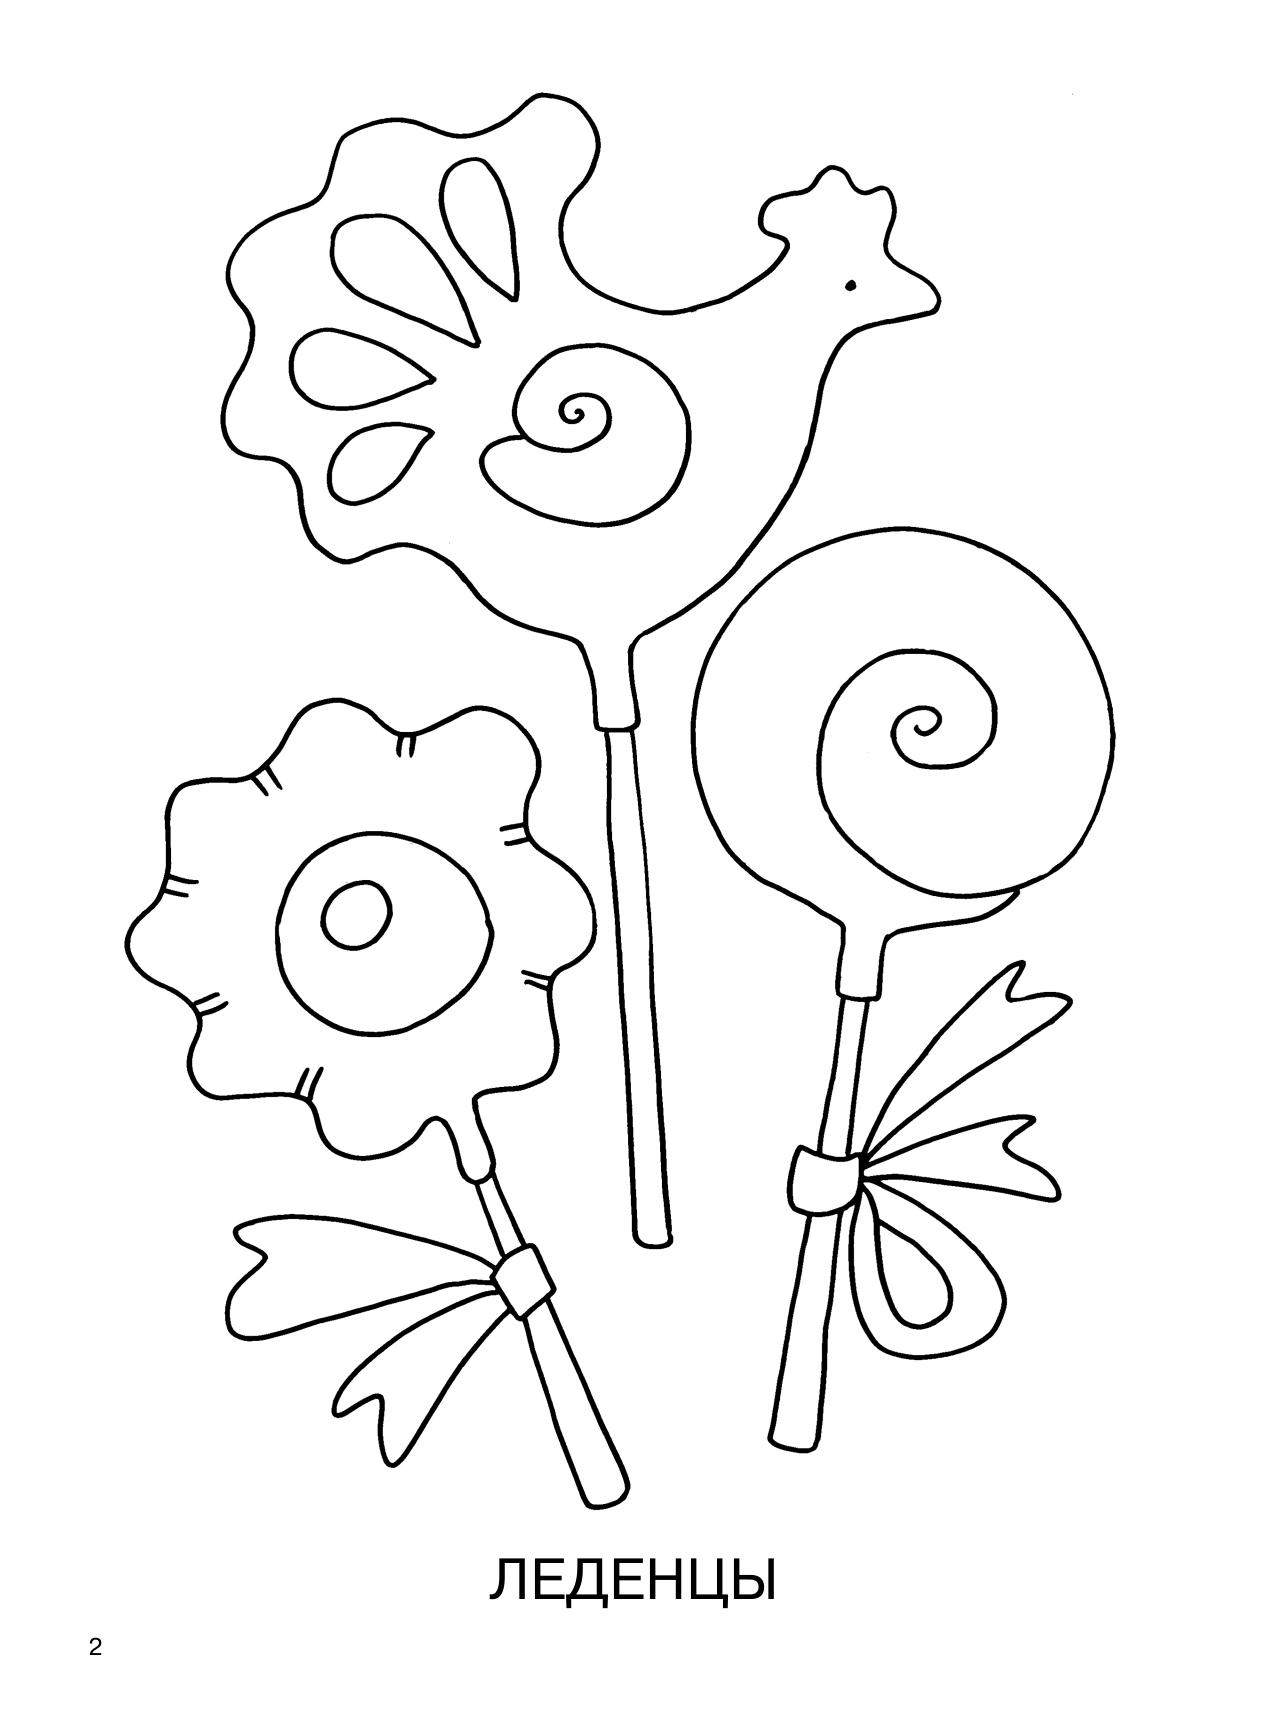 Предметные картинки карандашом